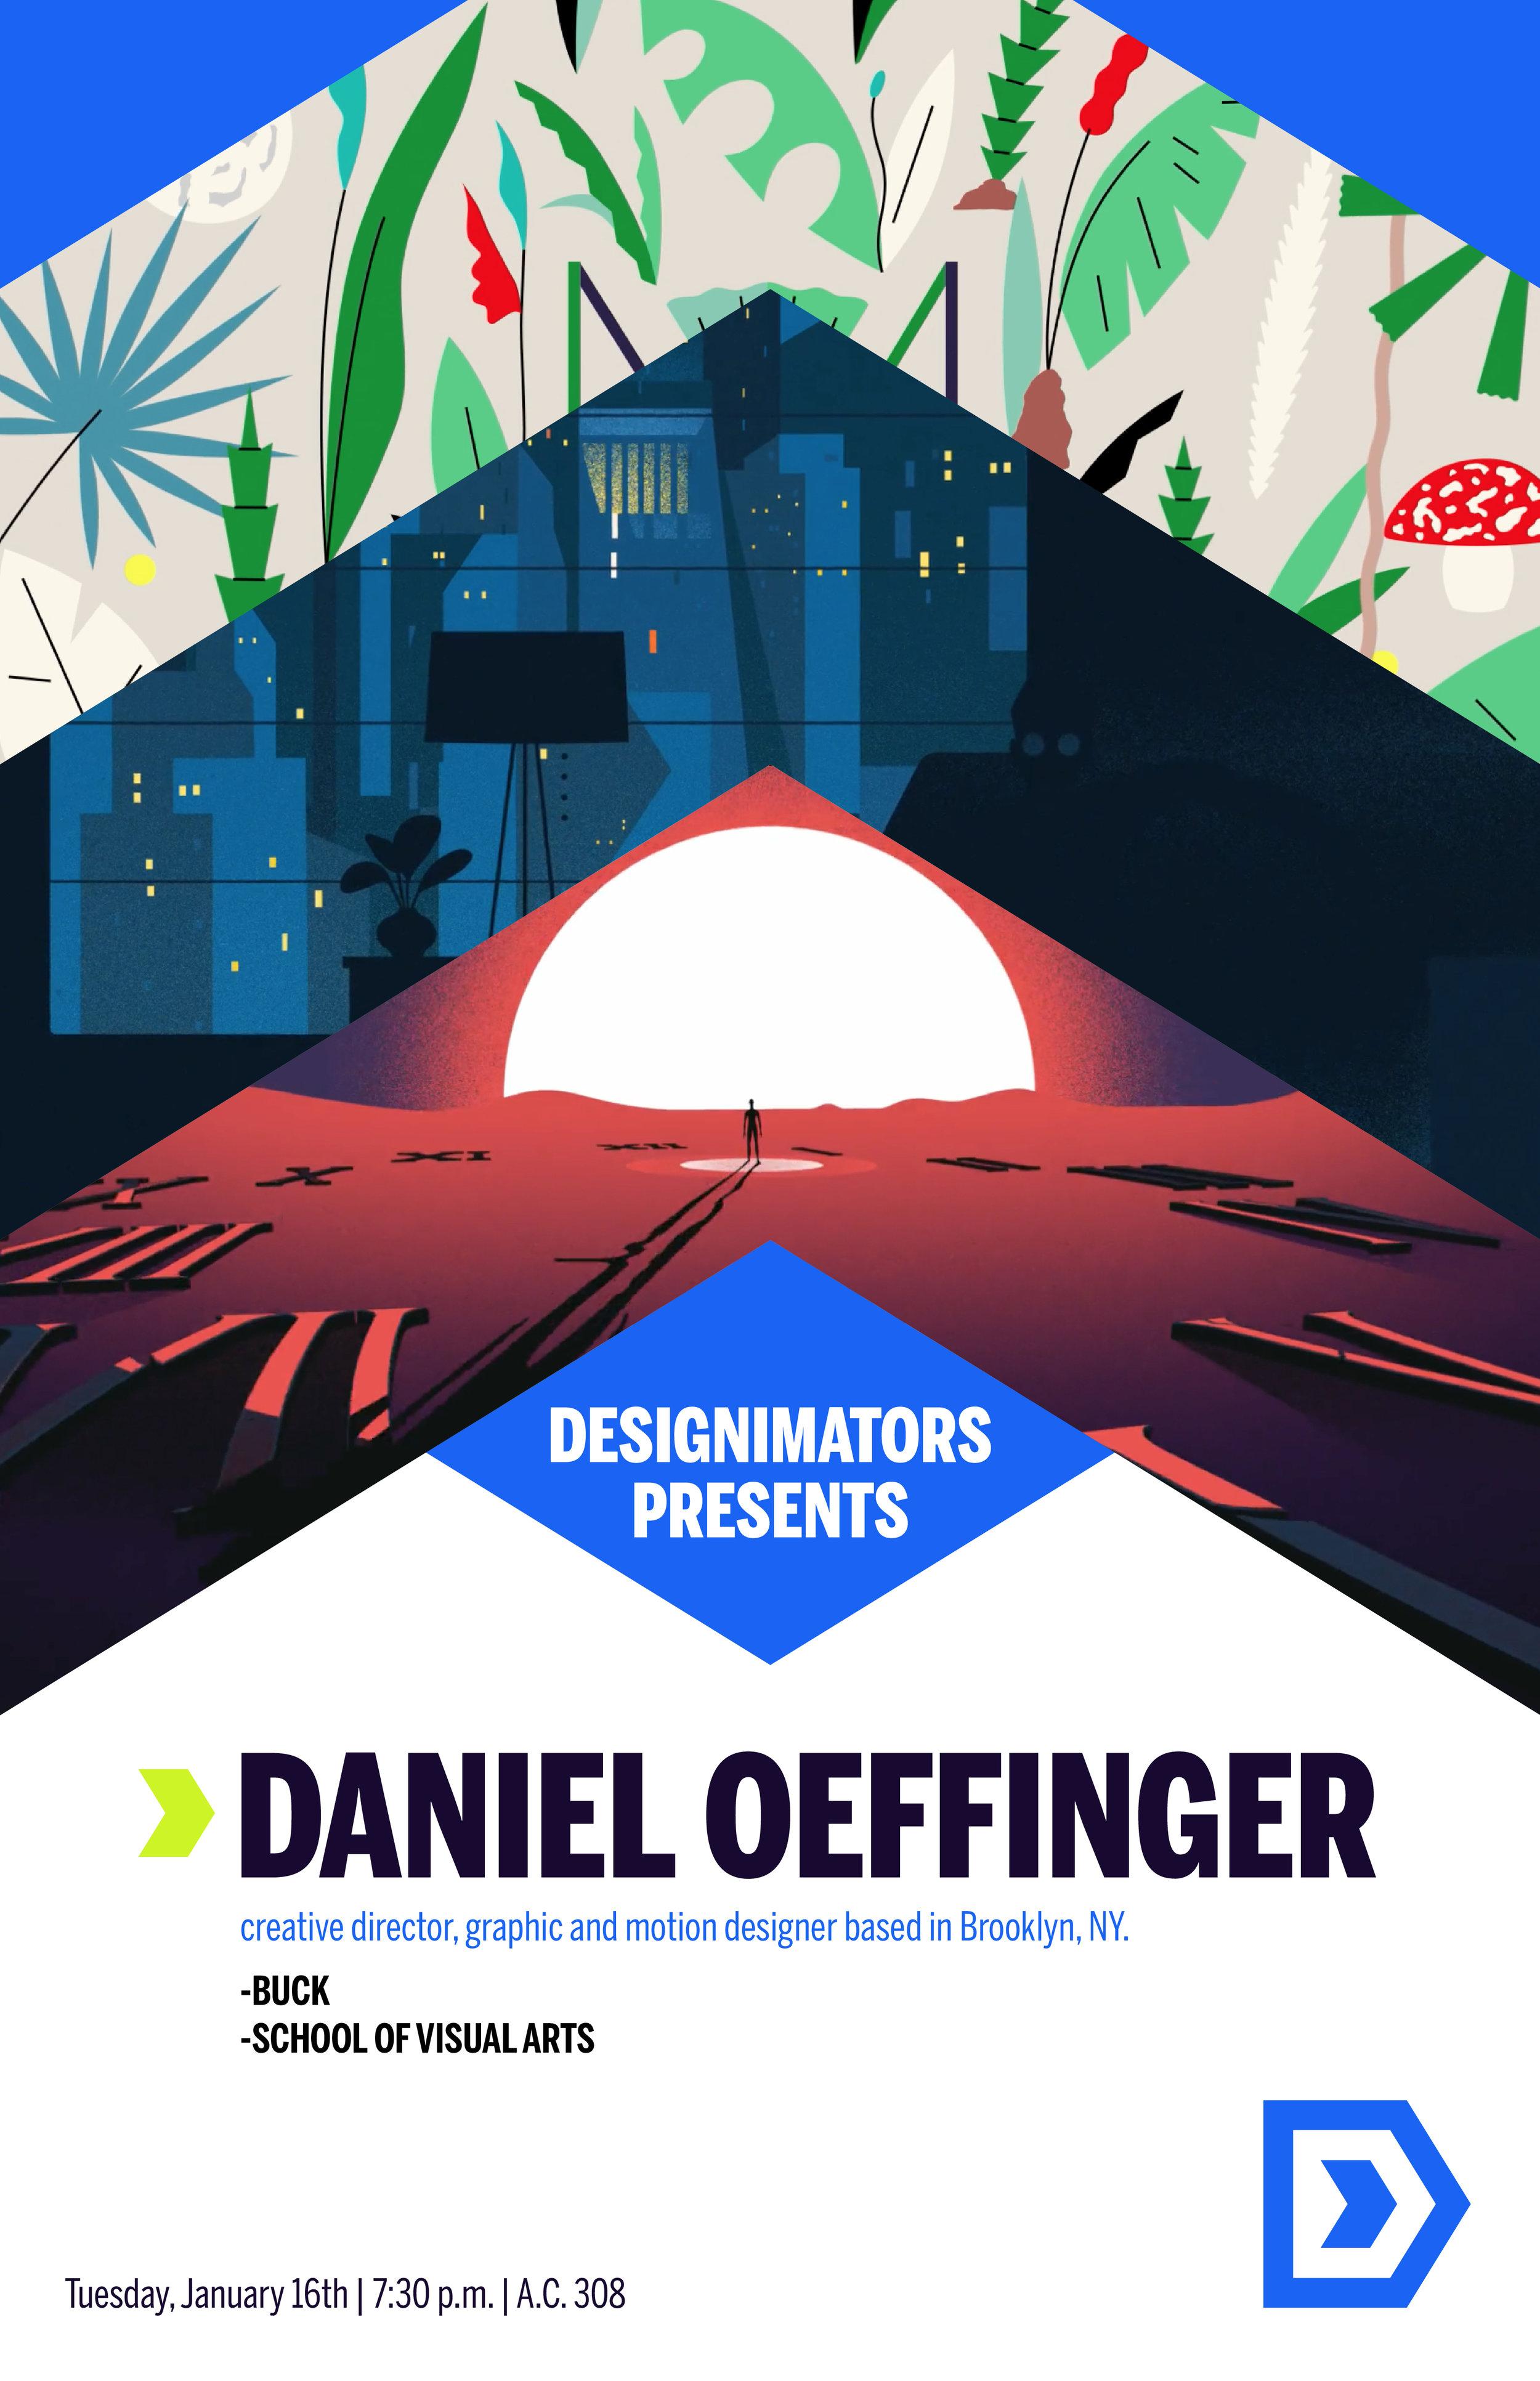 Designimators_danieloeffinger.jpg